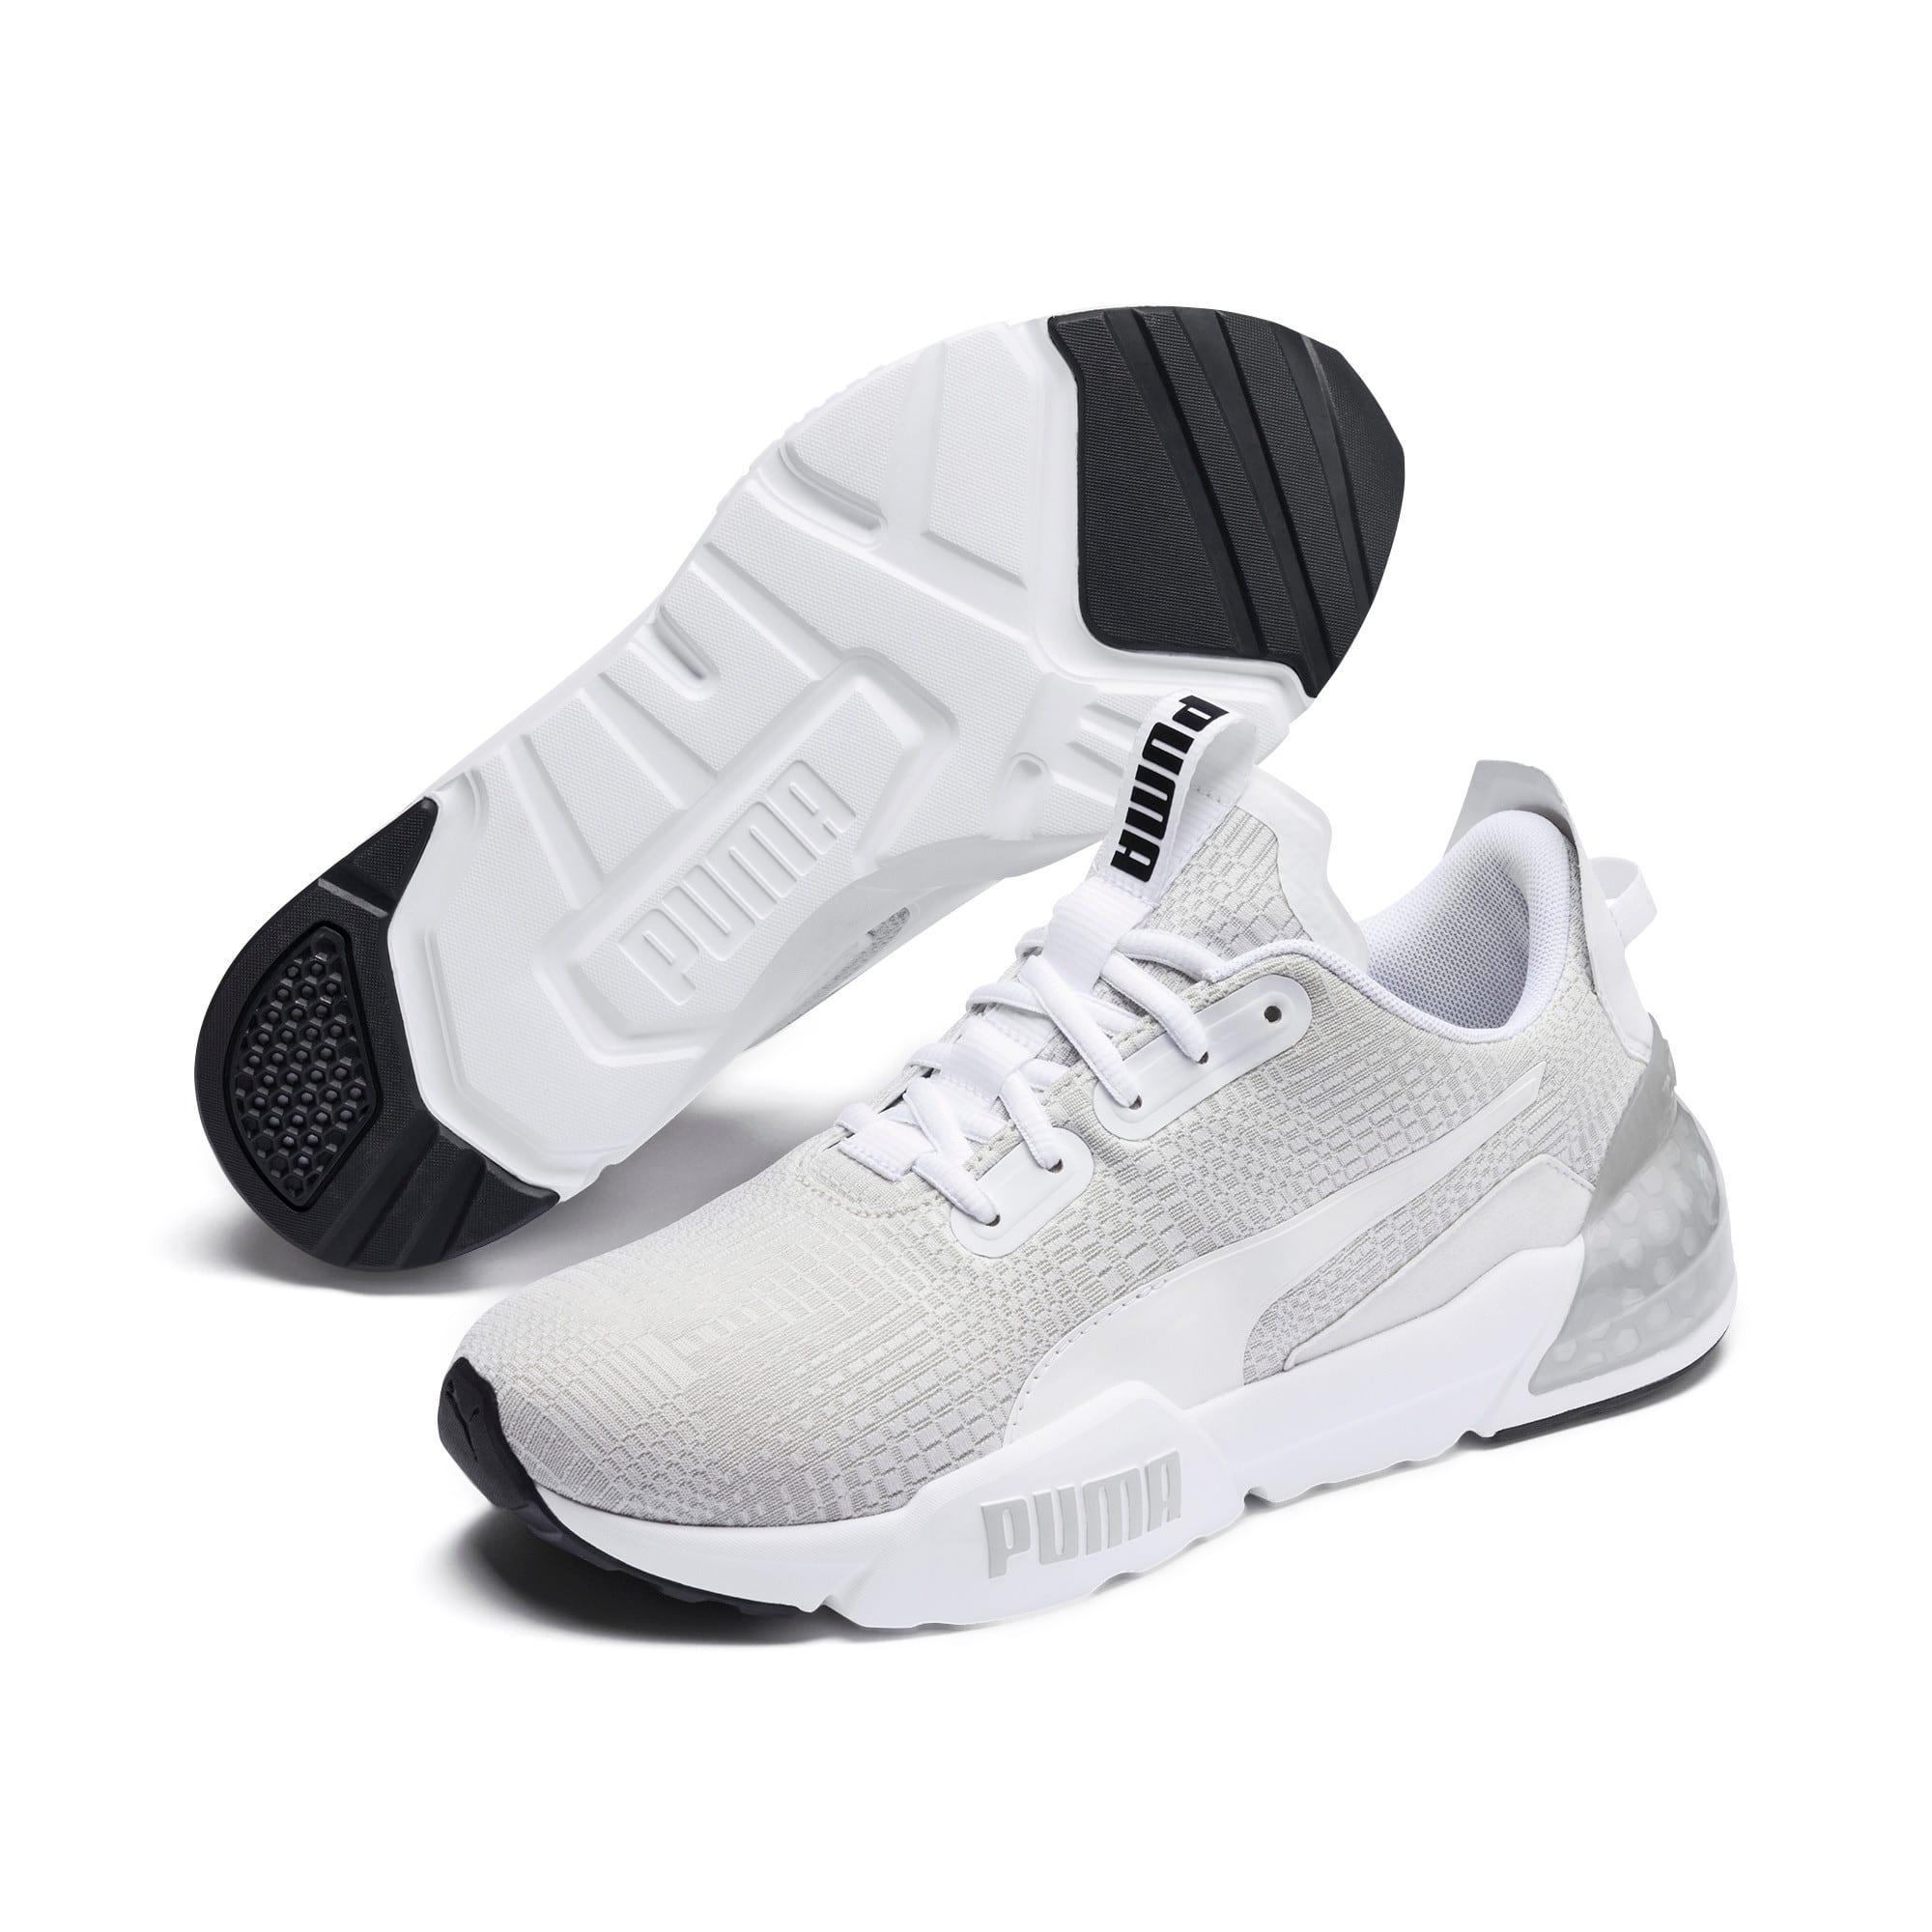 Thumbnail 3 of CELL Phase Lights Men's Training Shoes, Puma White-Gray Violet, medium